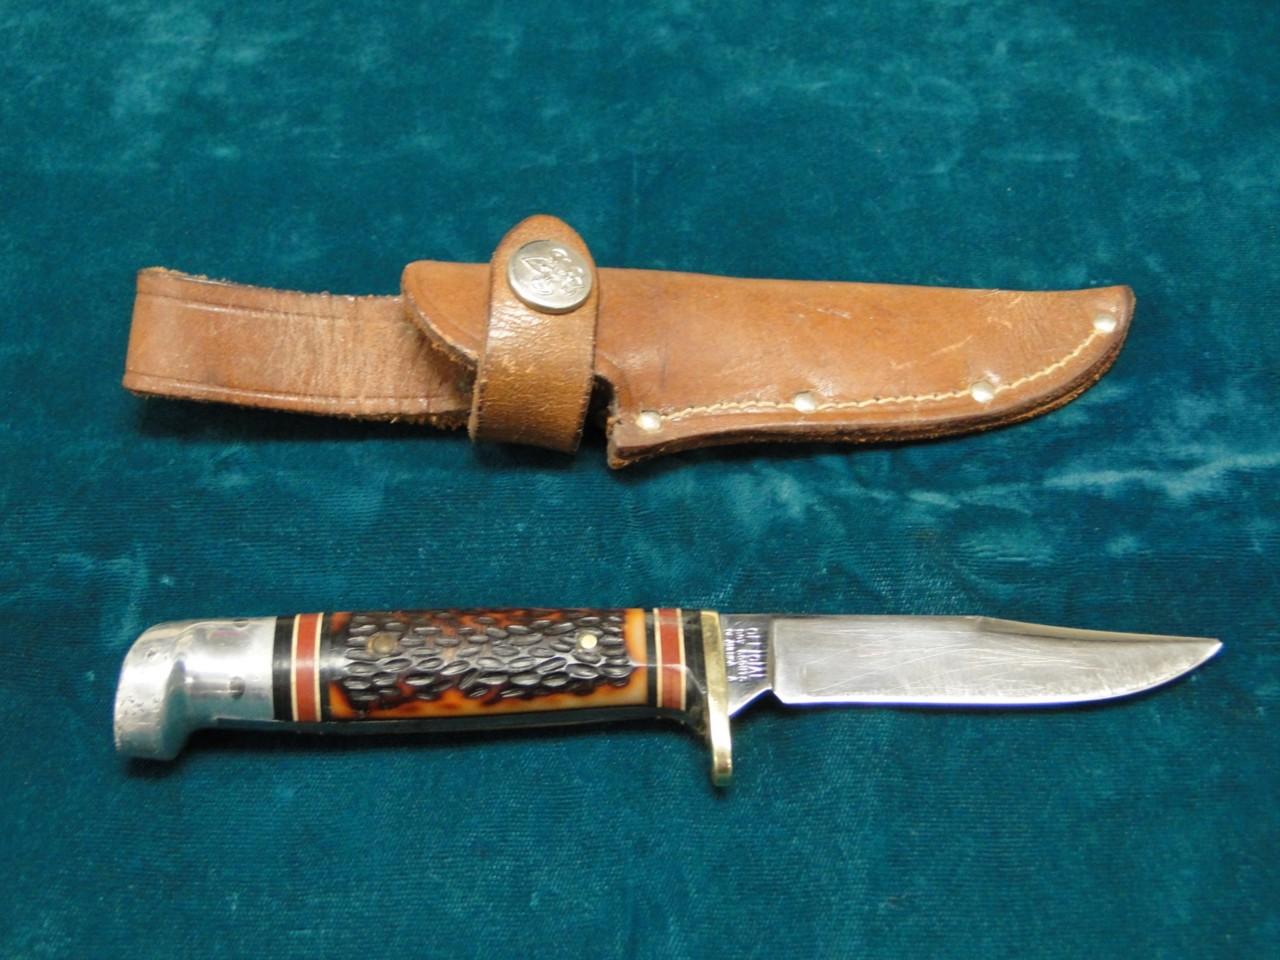 Western usa boy scout knife dating